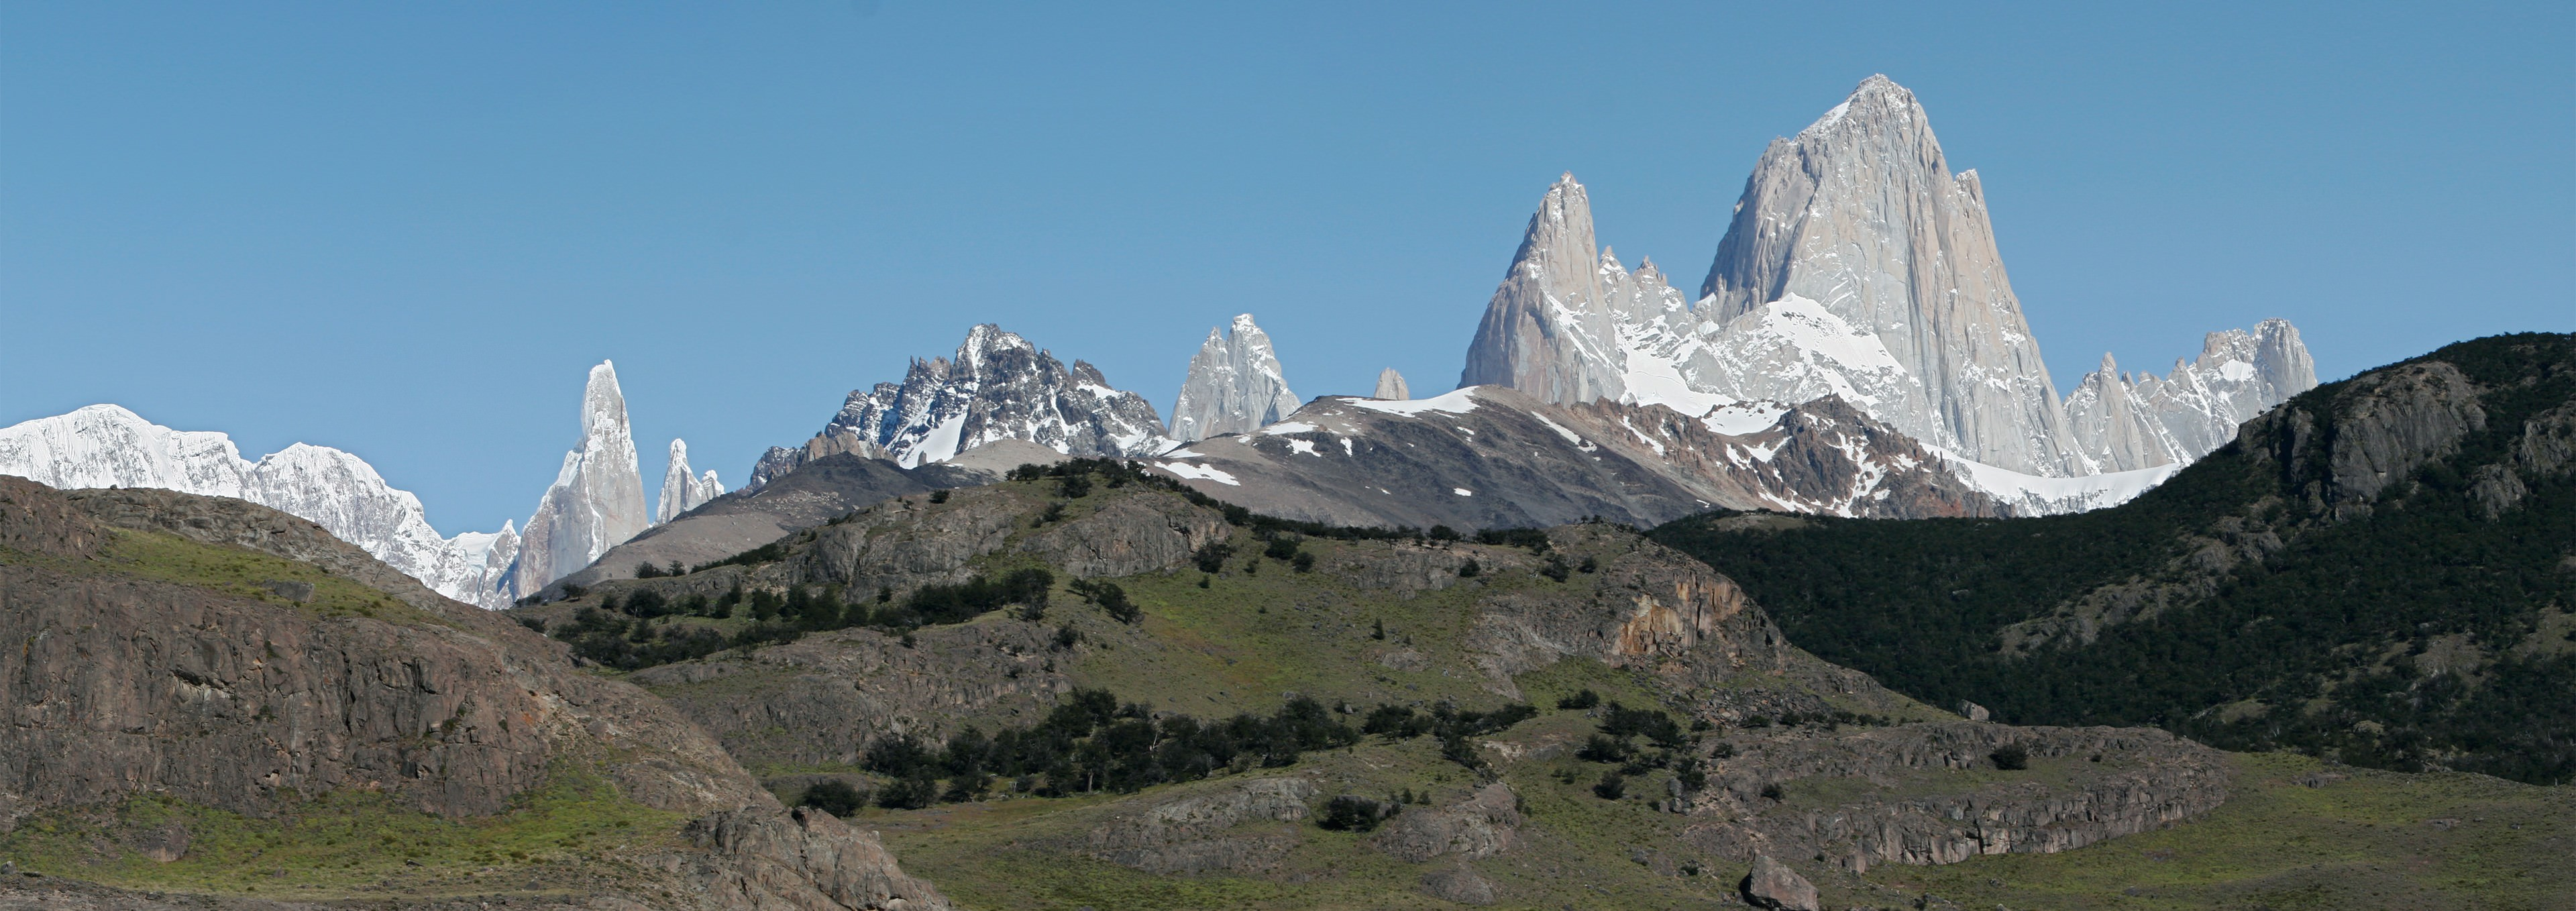 Untitled Panorama2